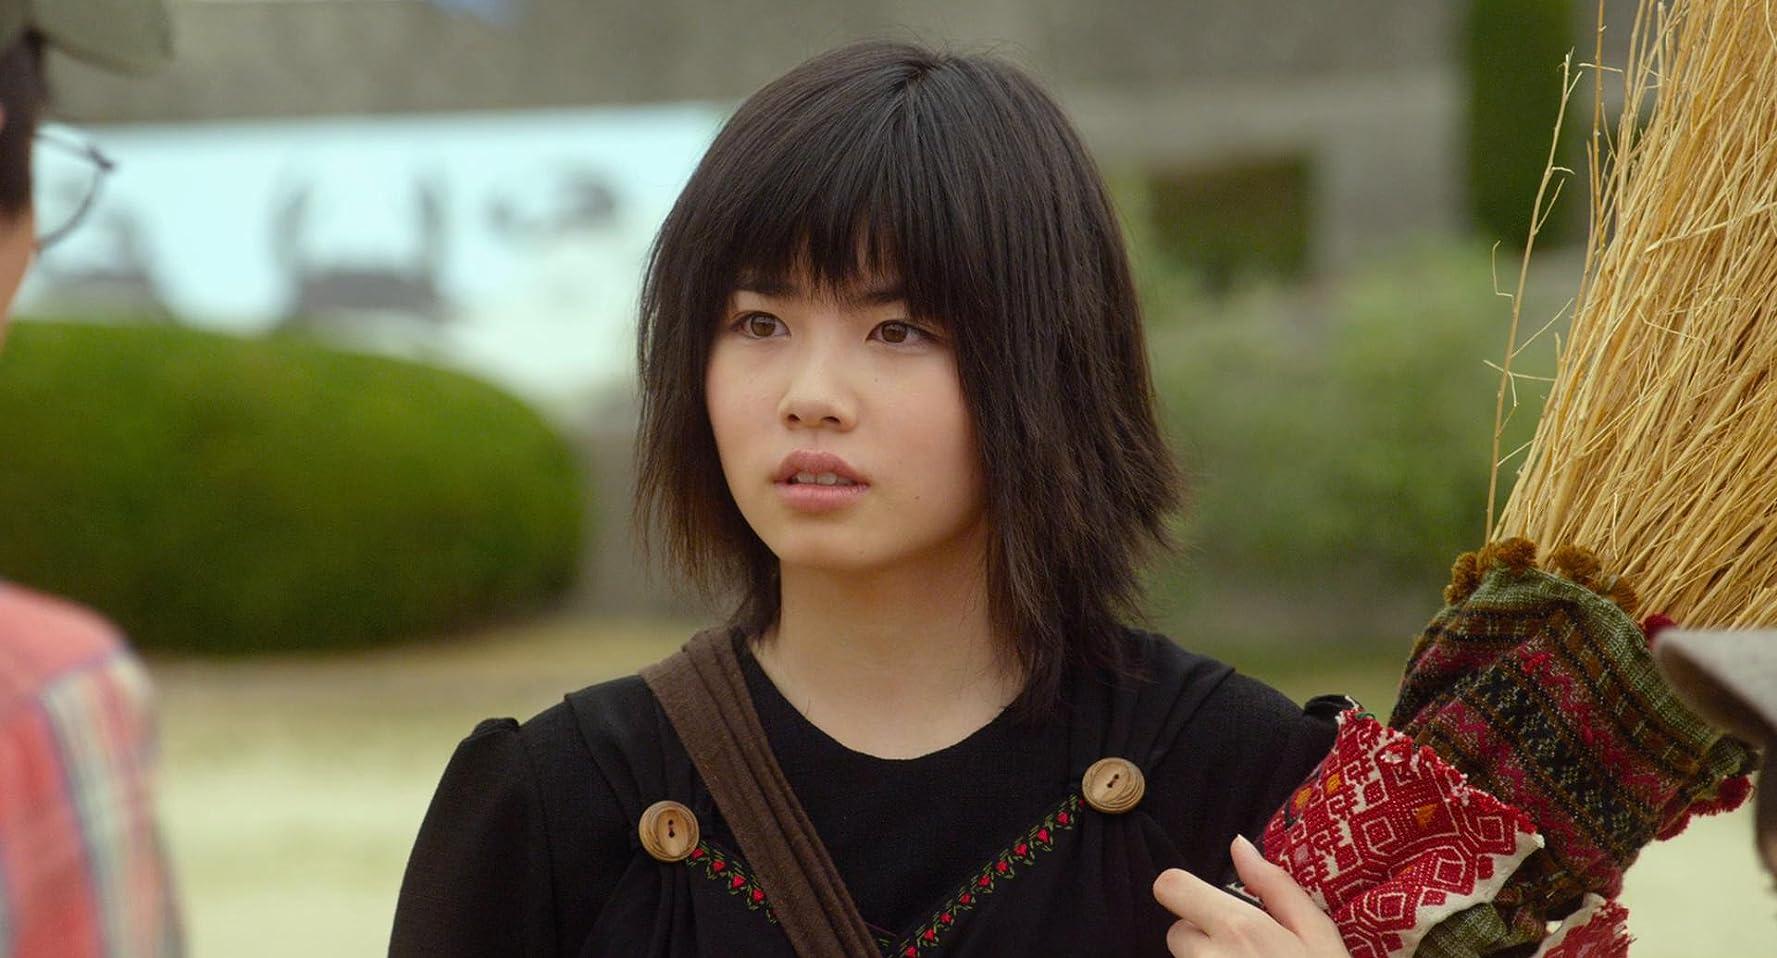 Fûka Koshiba in Majo no takkyûbin (2014)